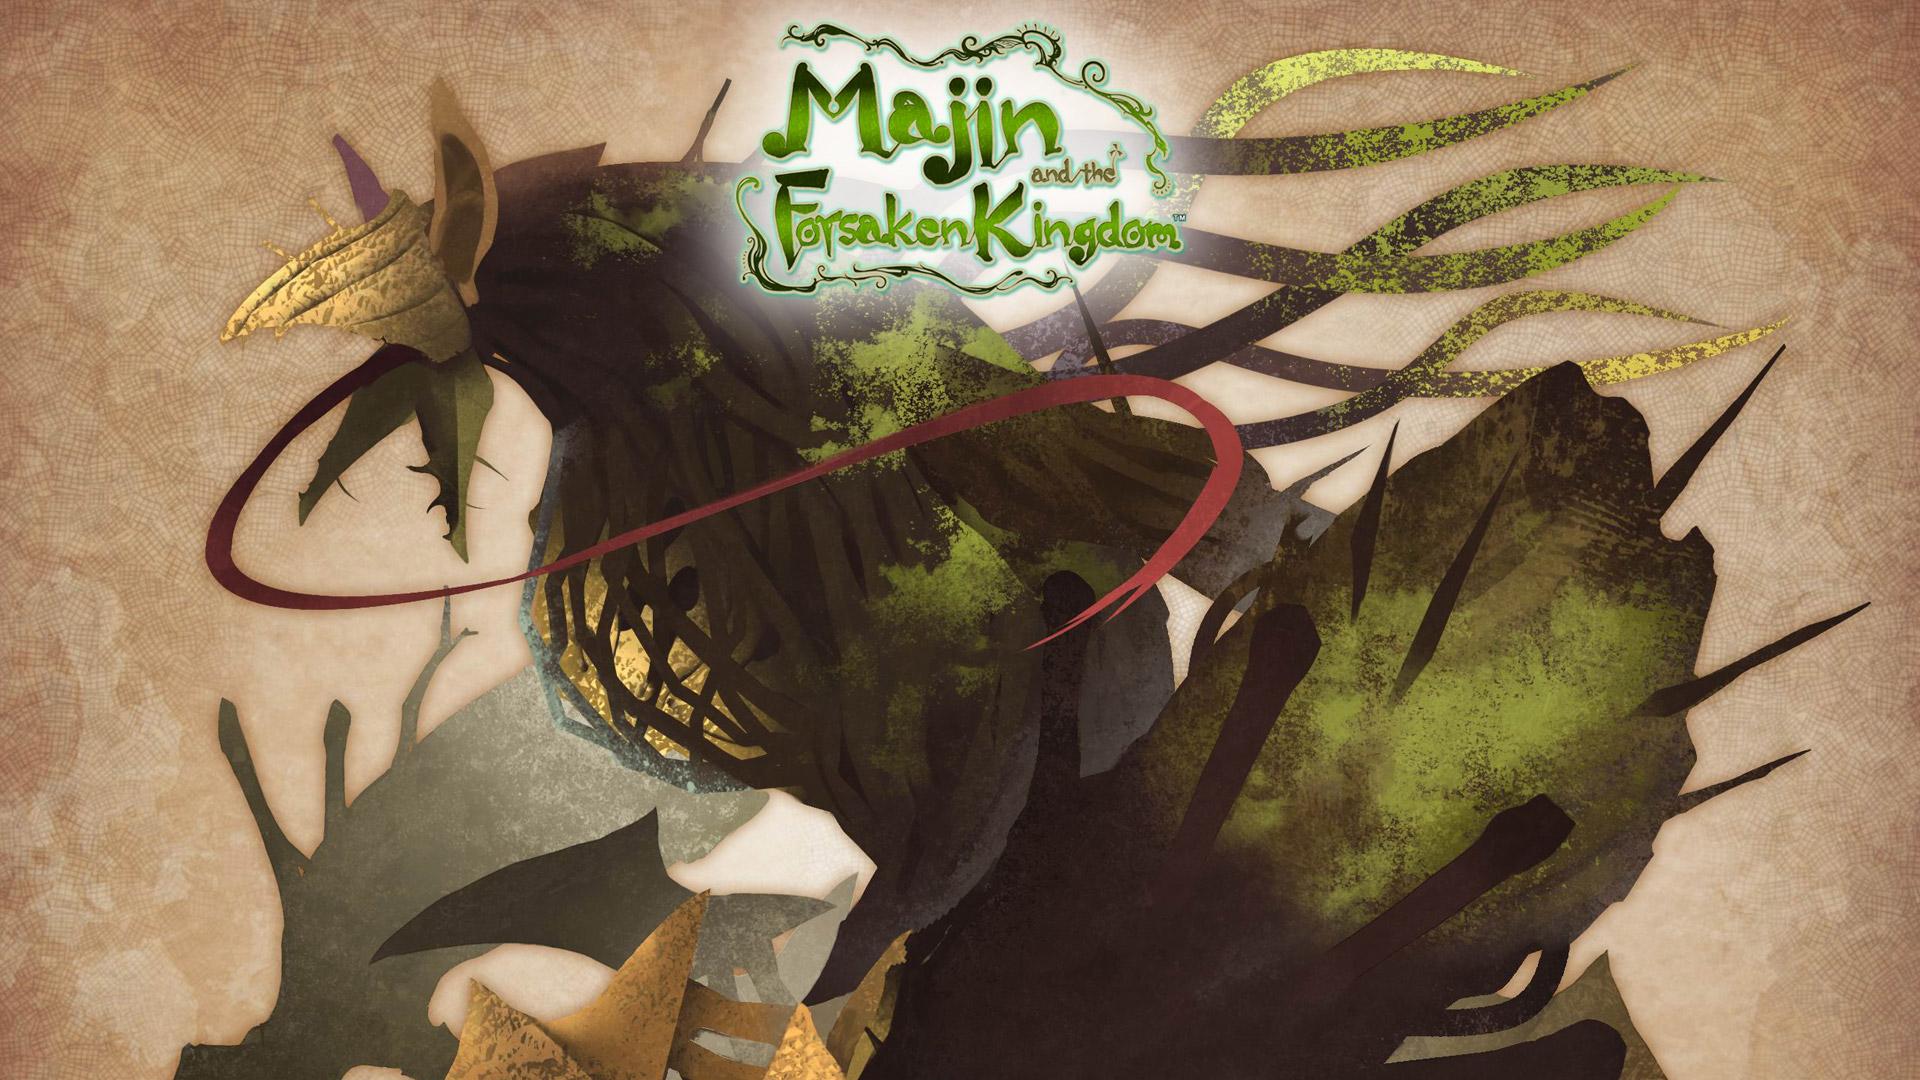 Majin and the Forsaken Kingdom Wallpaper in 1920x1080